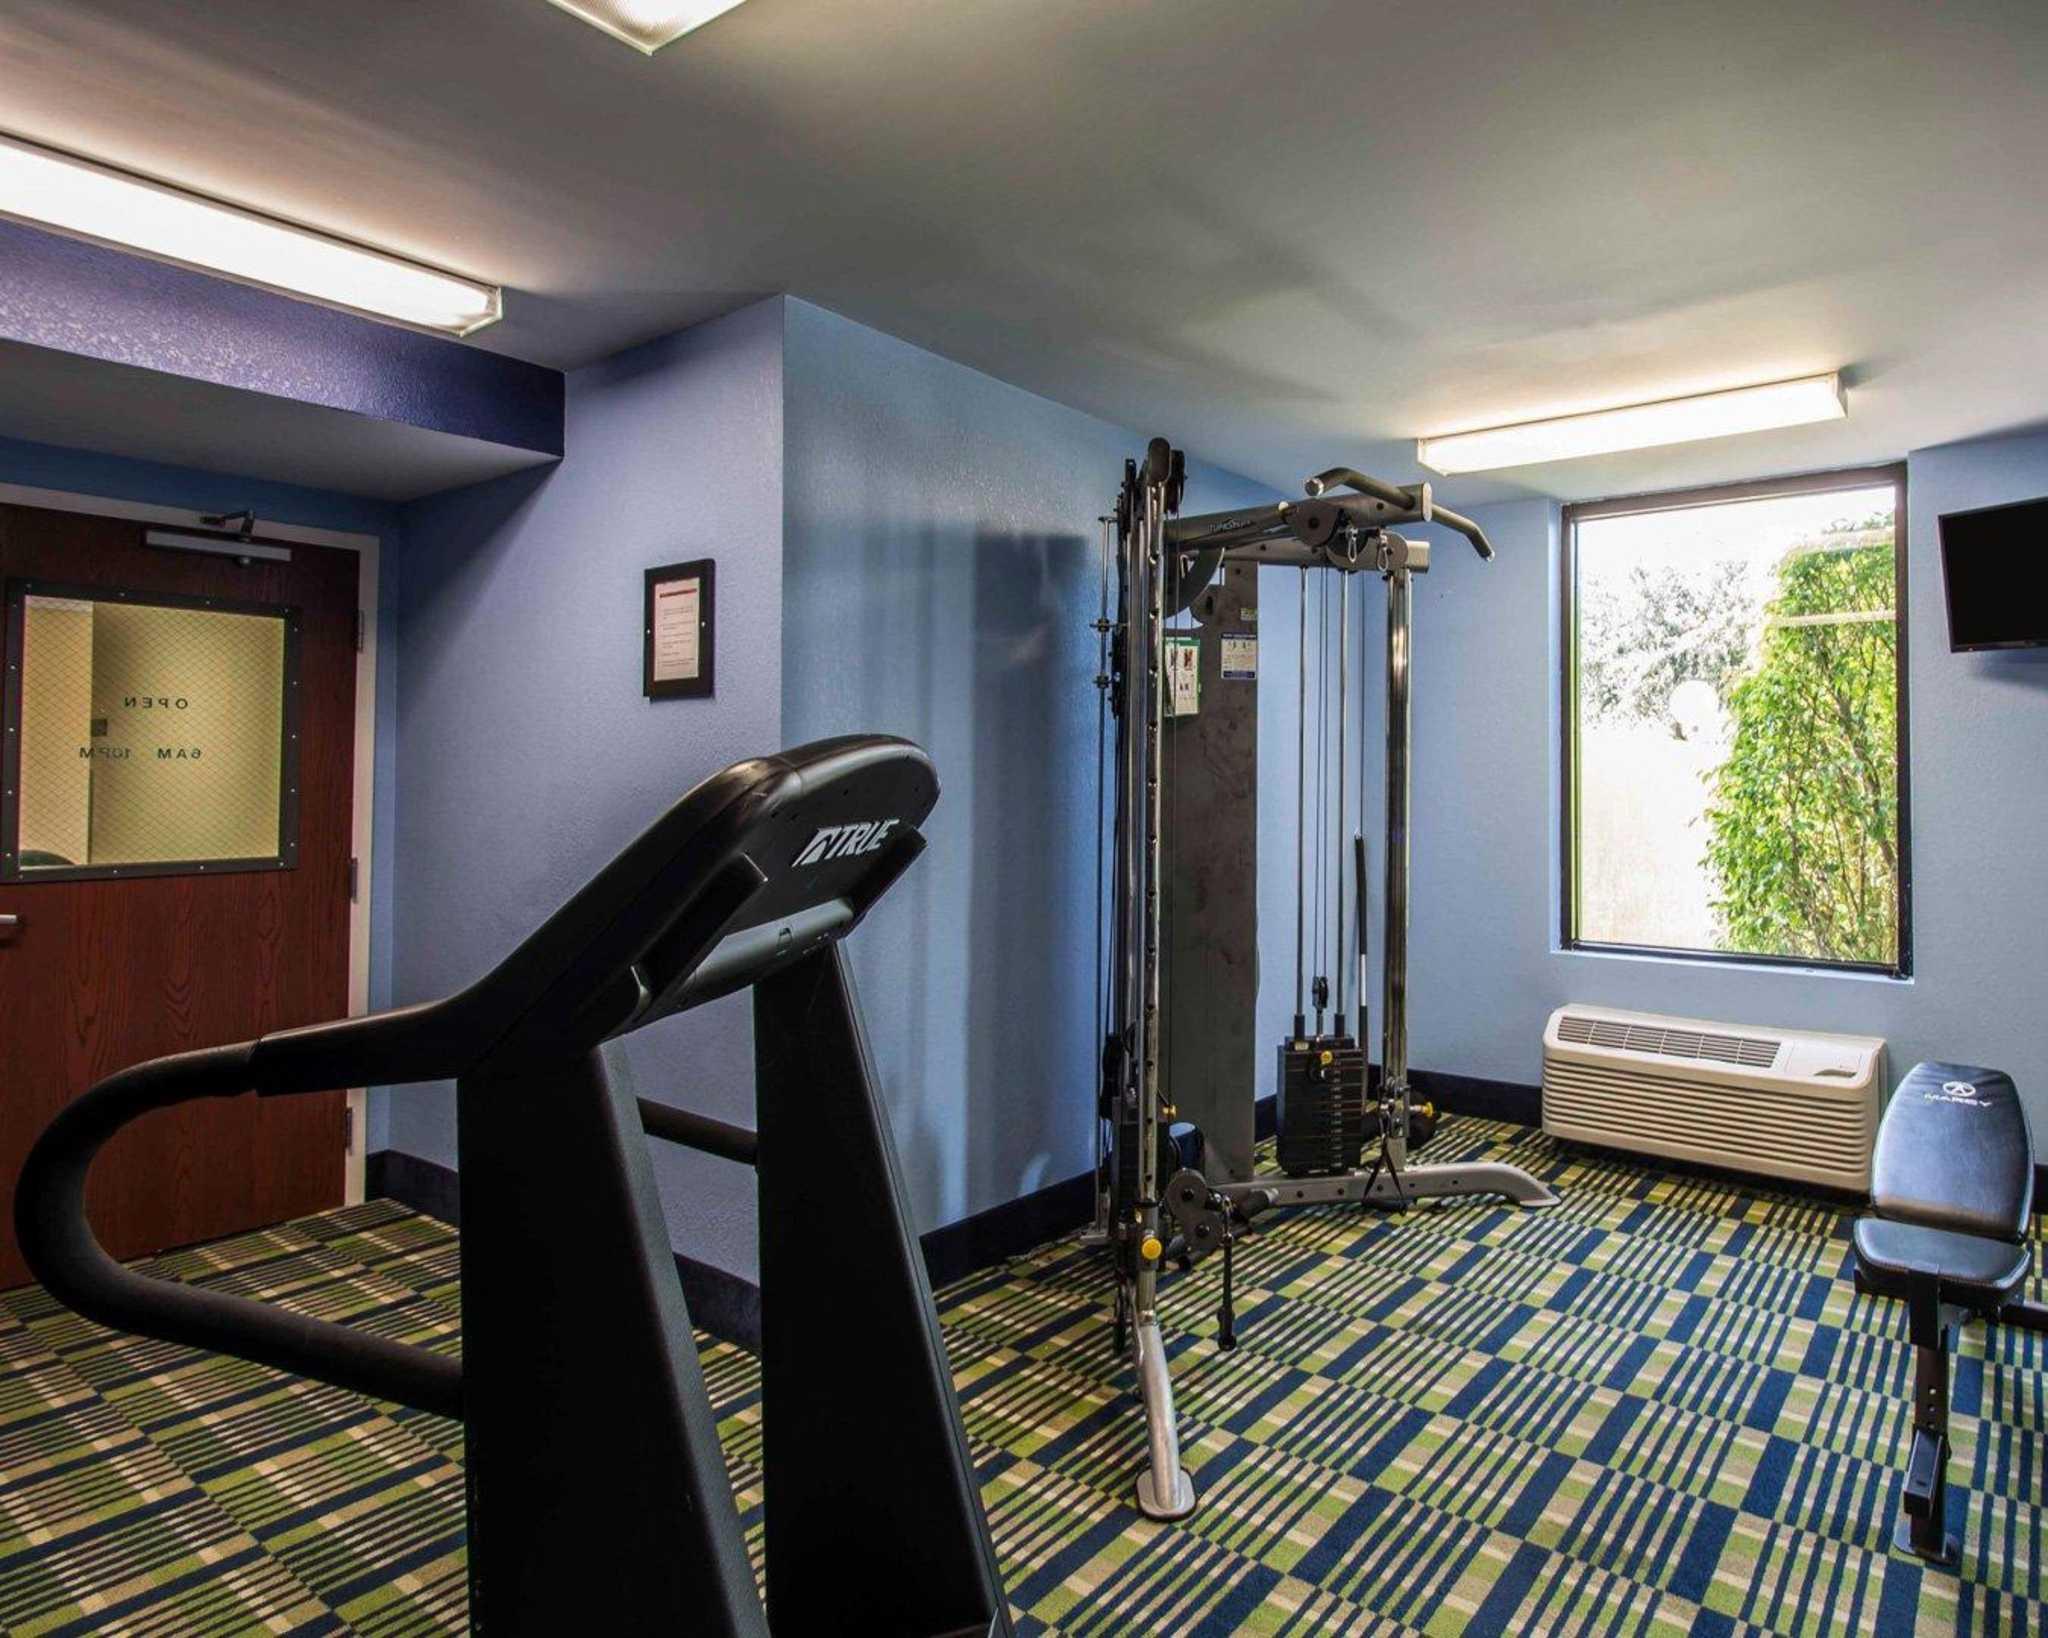 Comfort Inn & Suites Lantana - West Palm Beach South image 32